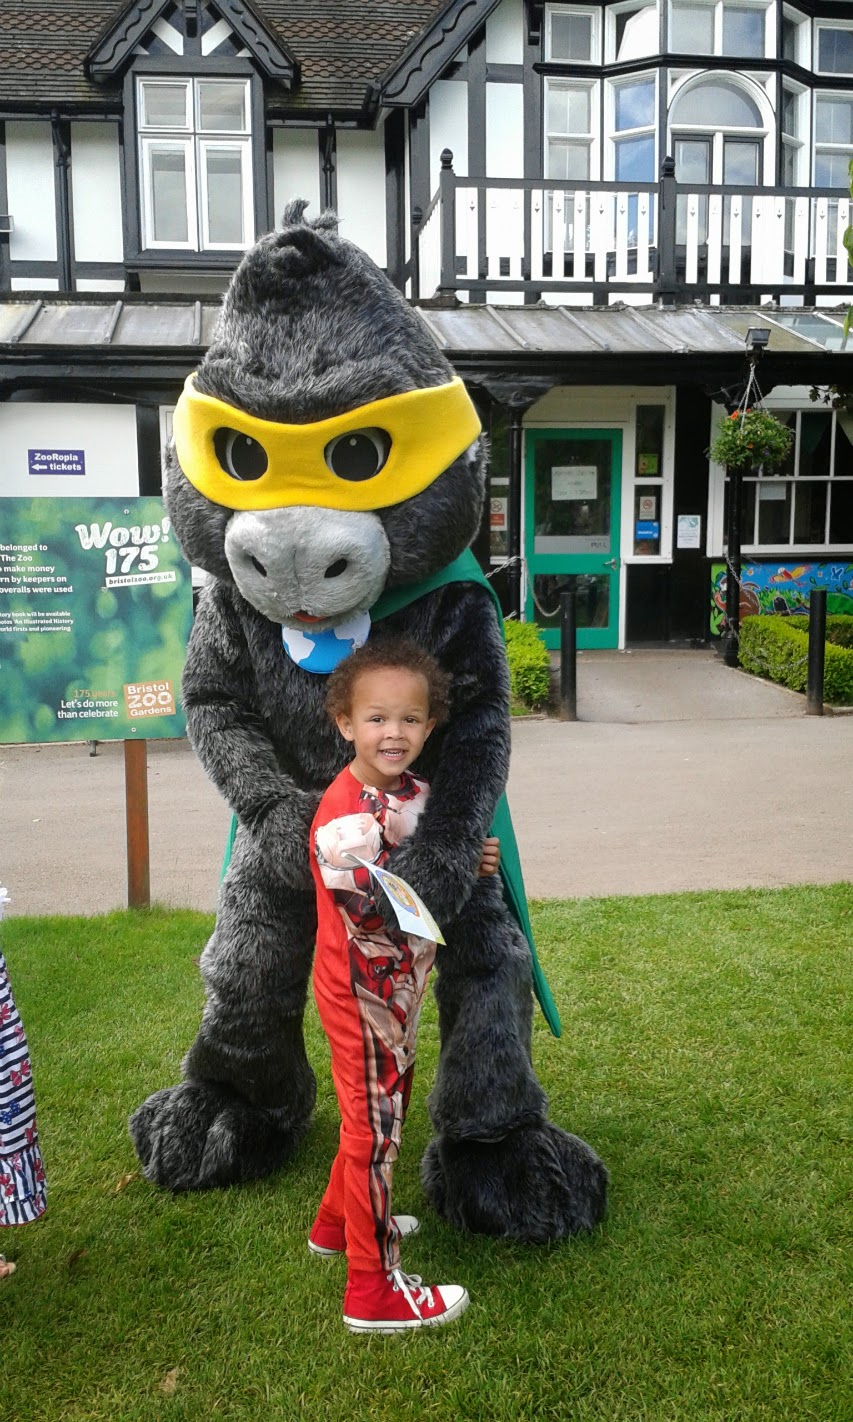 The Mascot of Bristol Zoo.